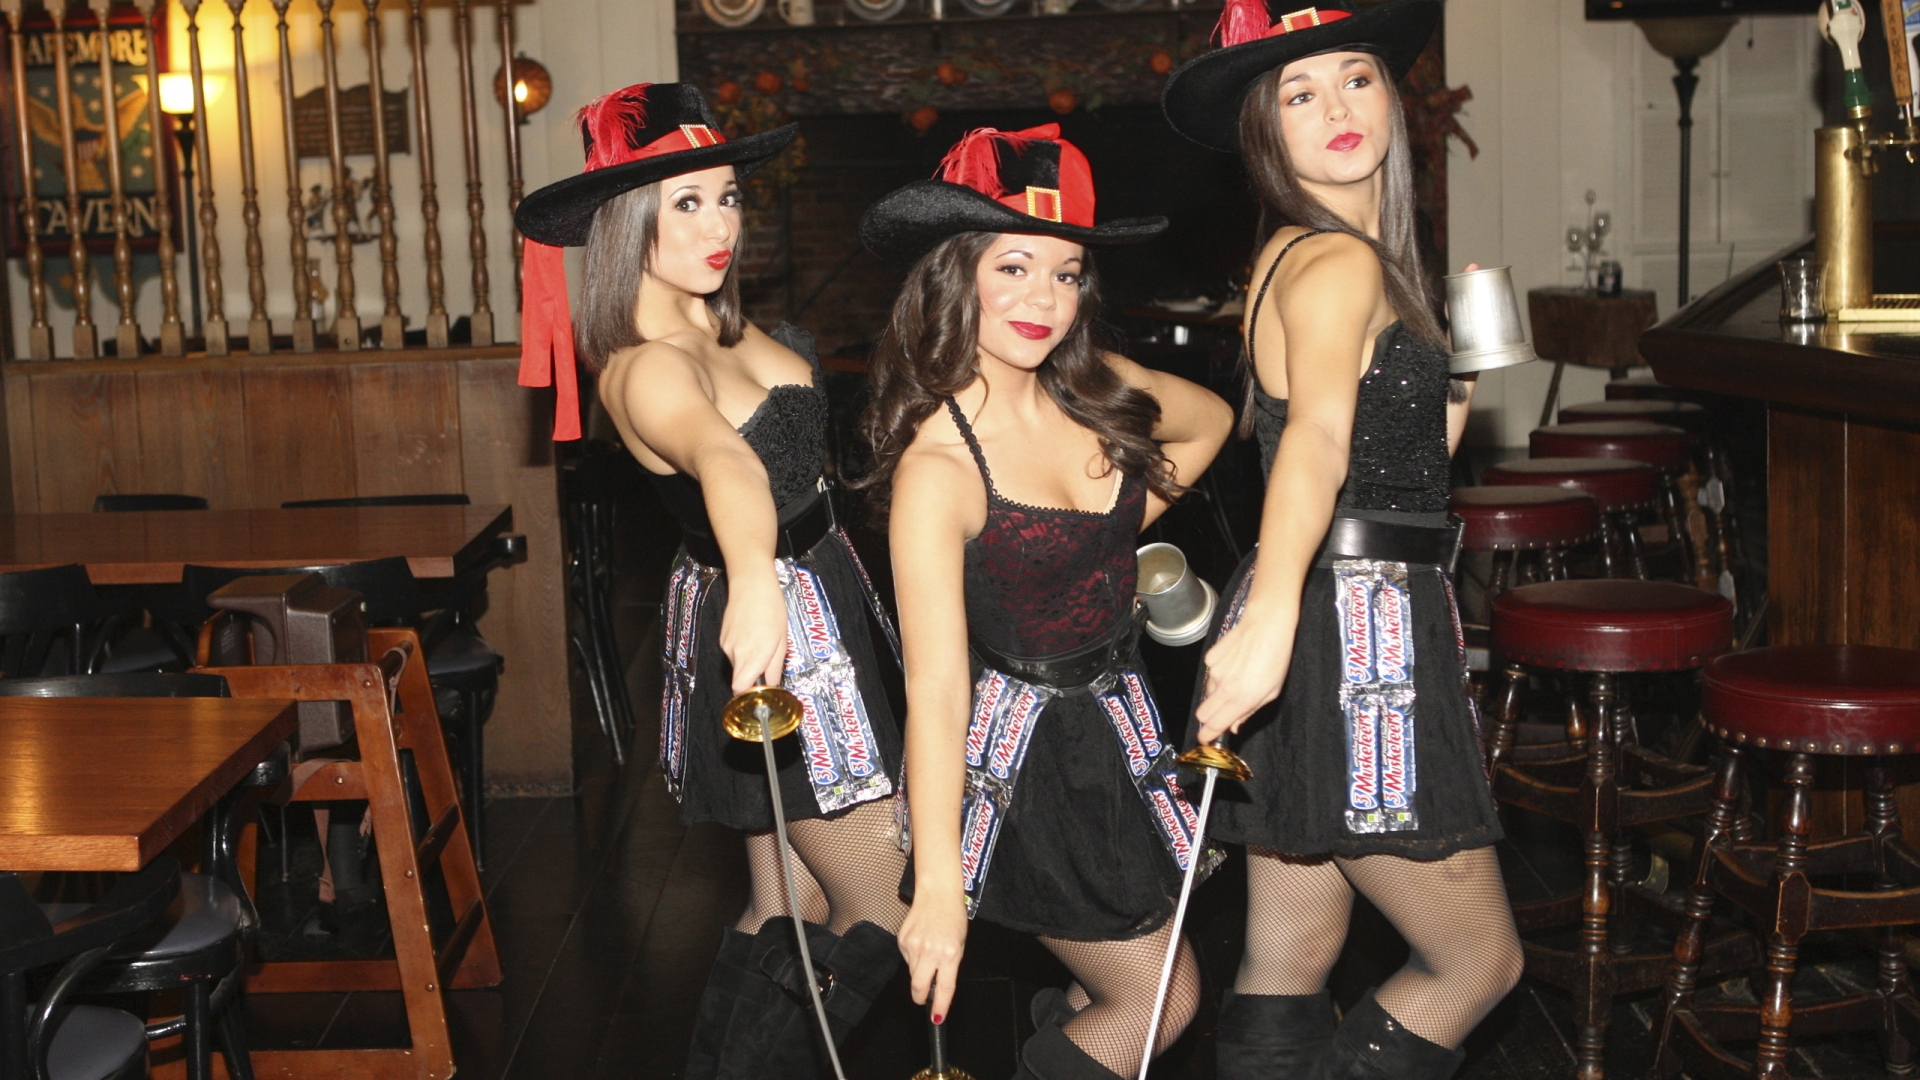 Tres Chicas mosqueteros - 1920x1080